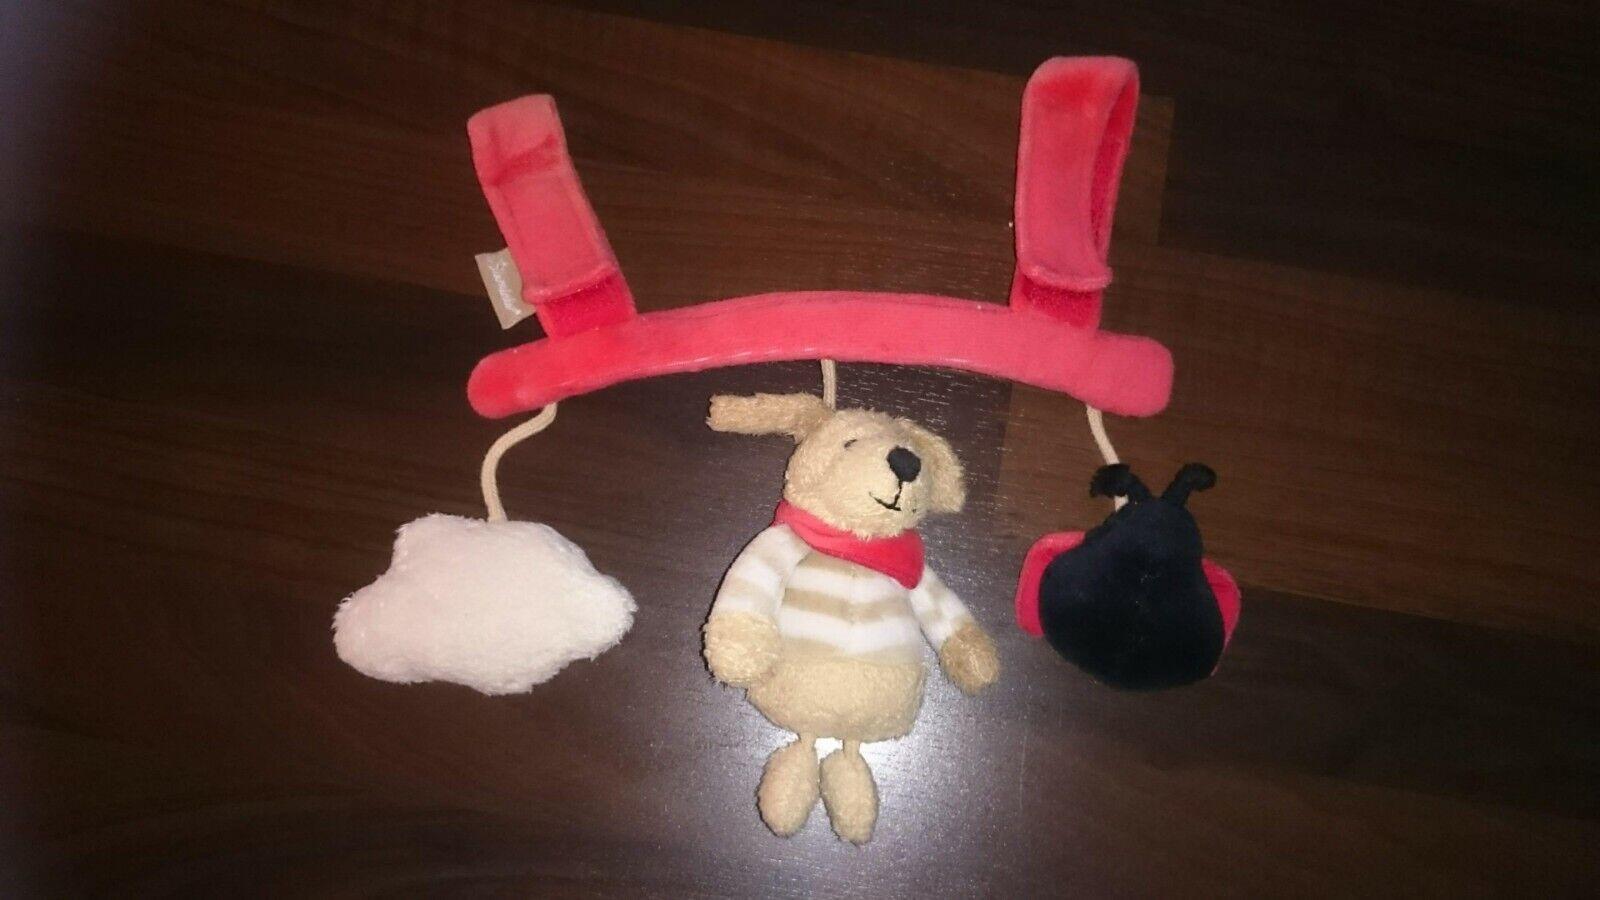 STERNTALER Spielzeug Hund Wolke Käfer Babyschale Maxi Cosi Mobile Baby Auto rot